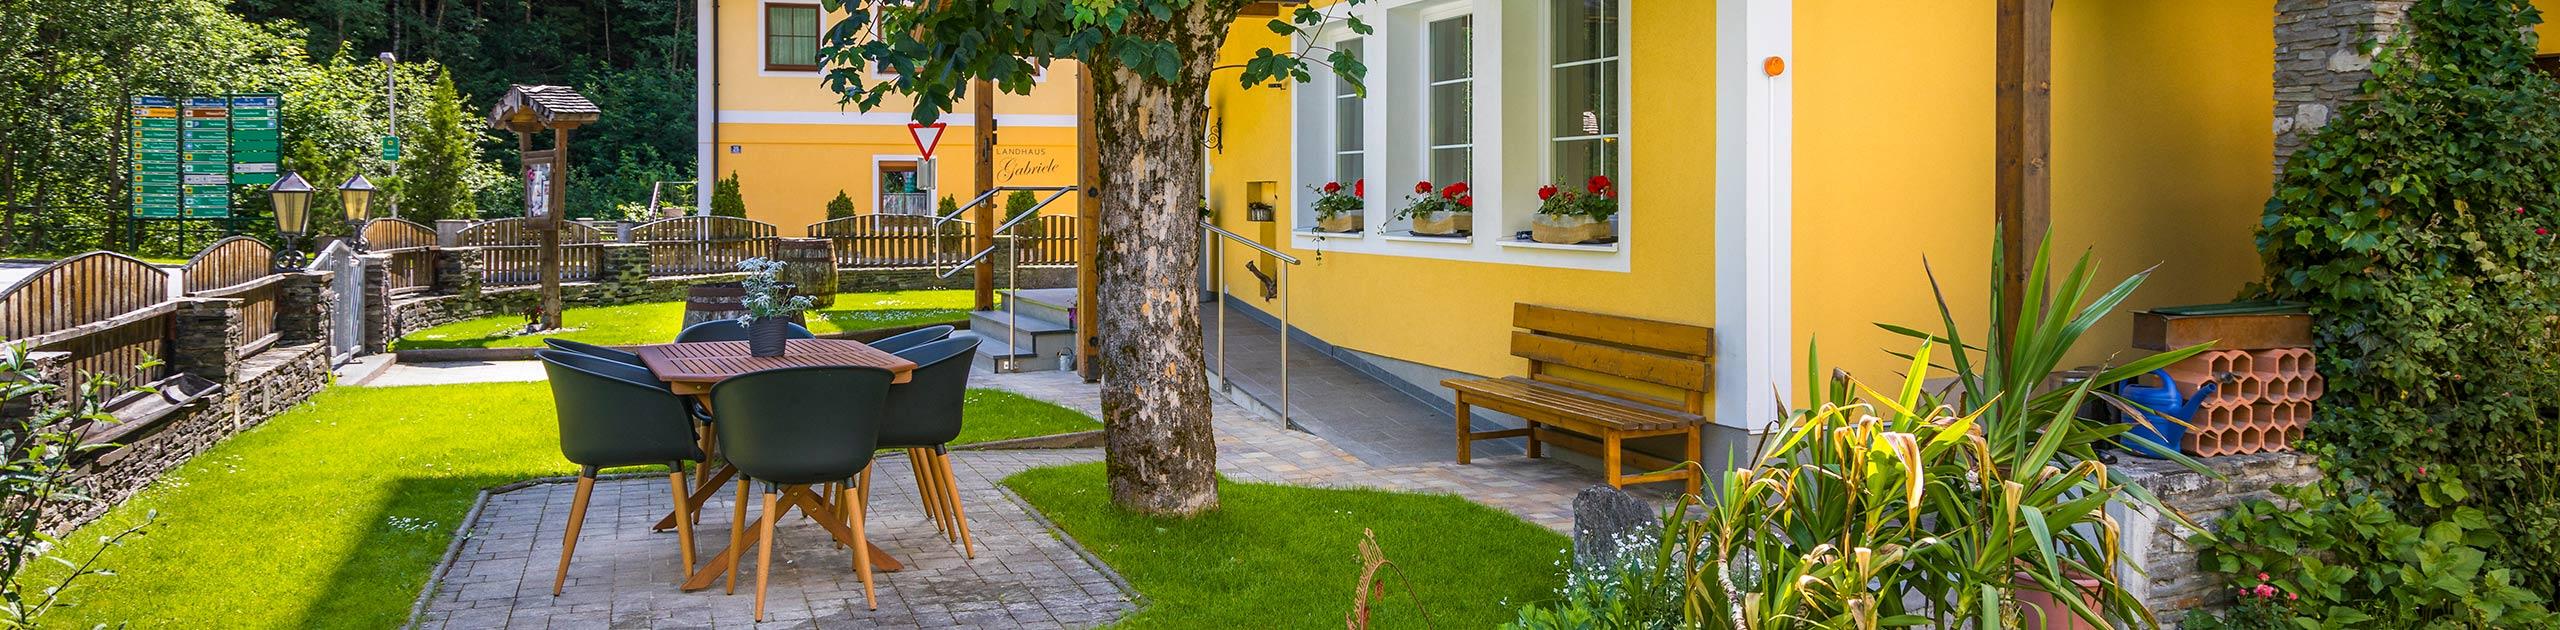 Garten Pension Gabriele